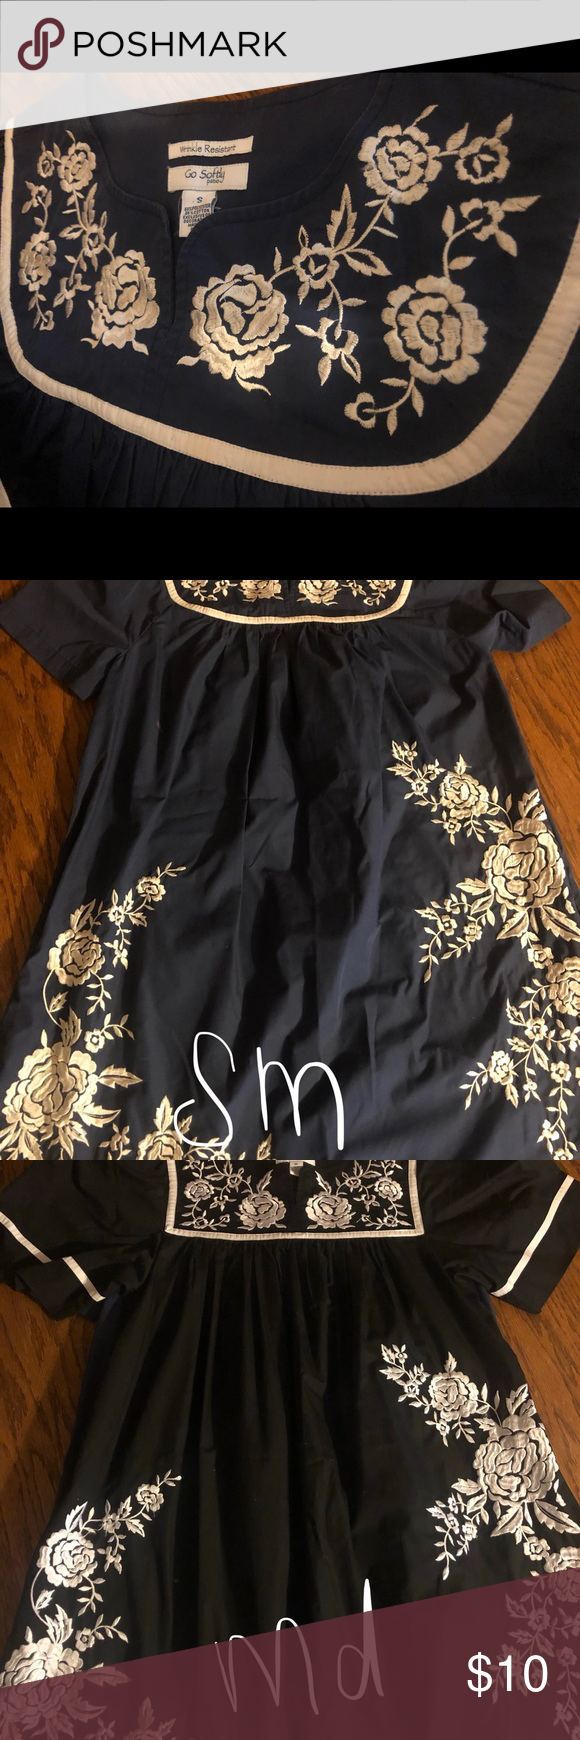 go softly patio dresses go softly brand